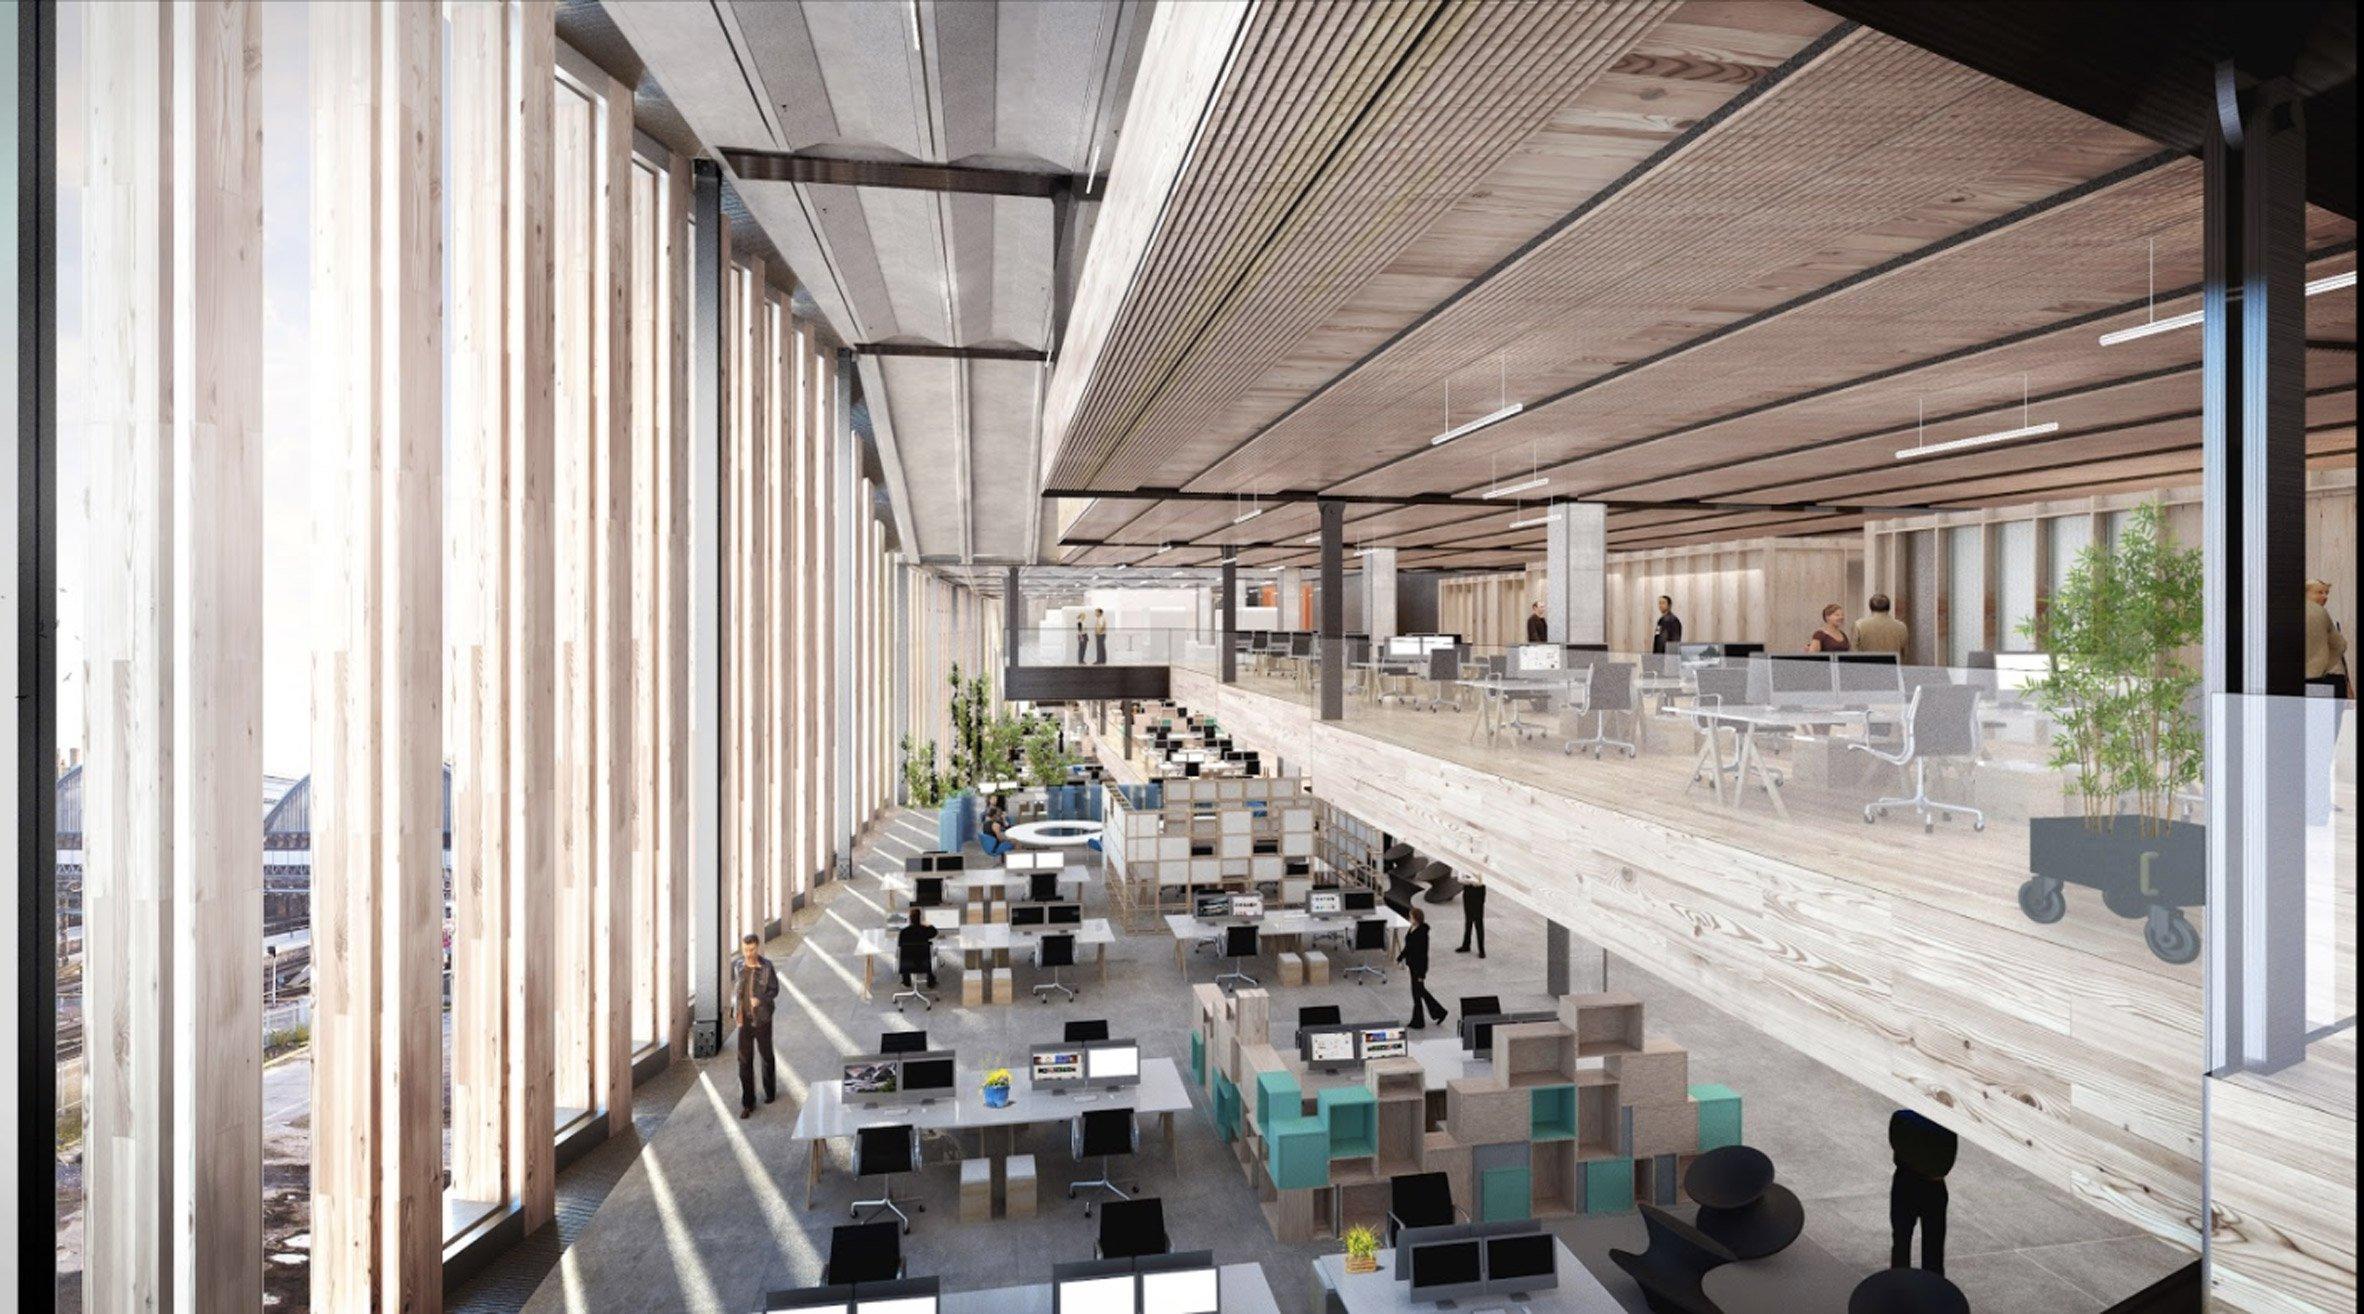 google-hq-news-architecture-offices-london-big-heatherwick-_dezeen_2364_col_5